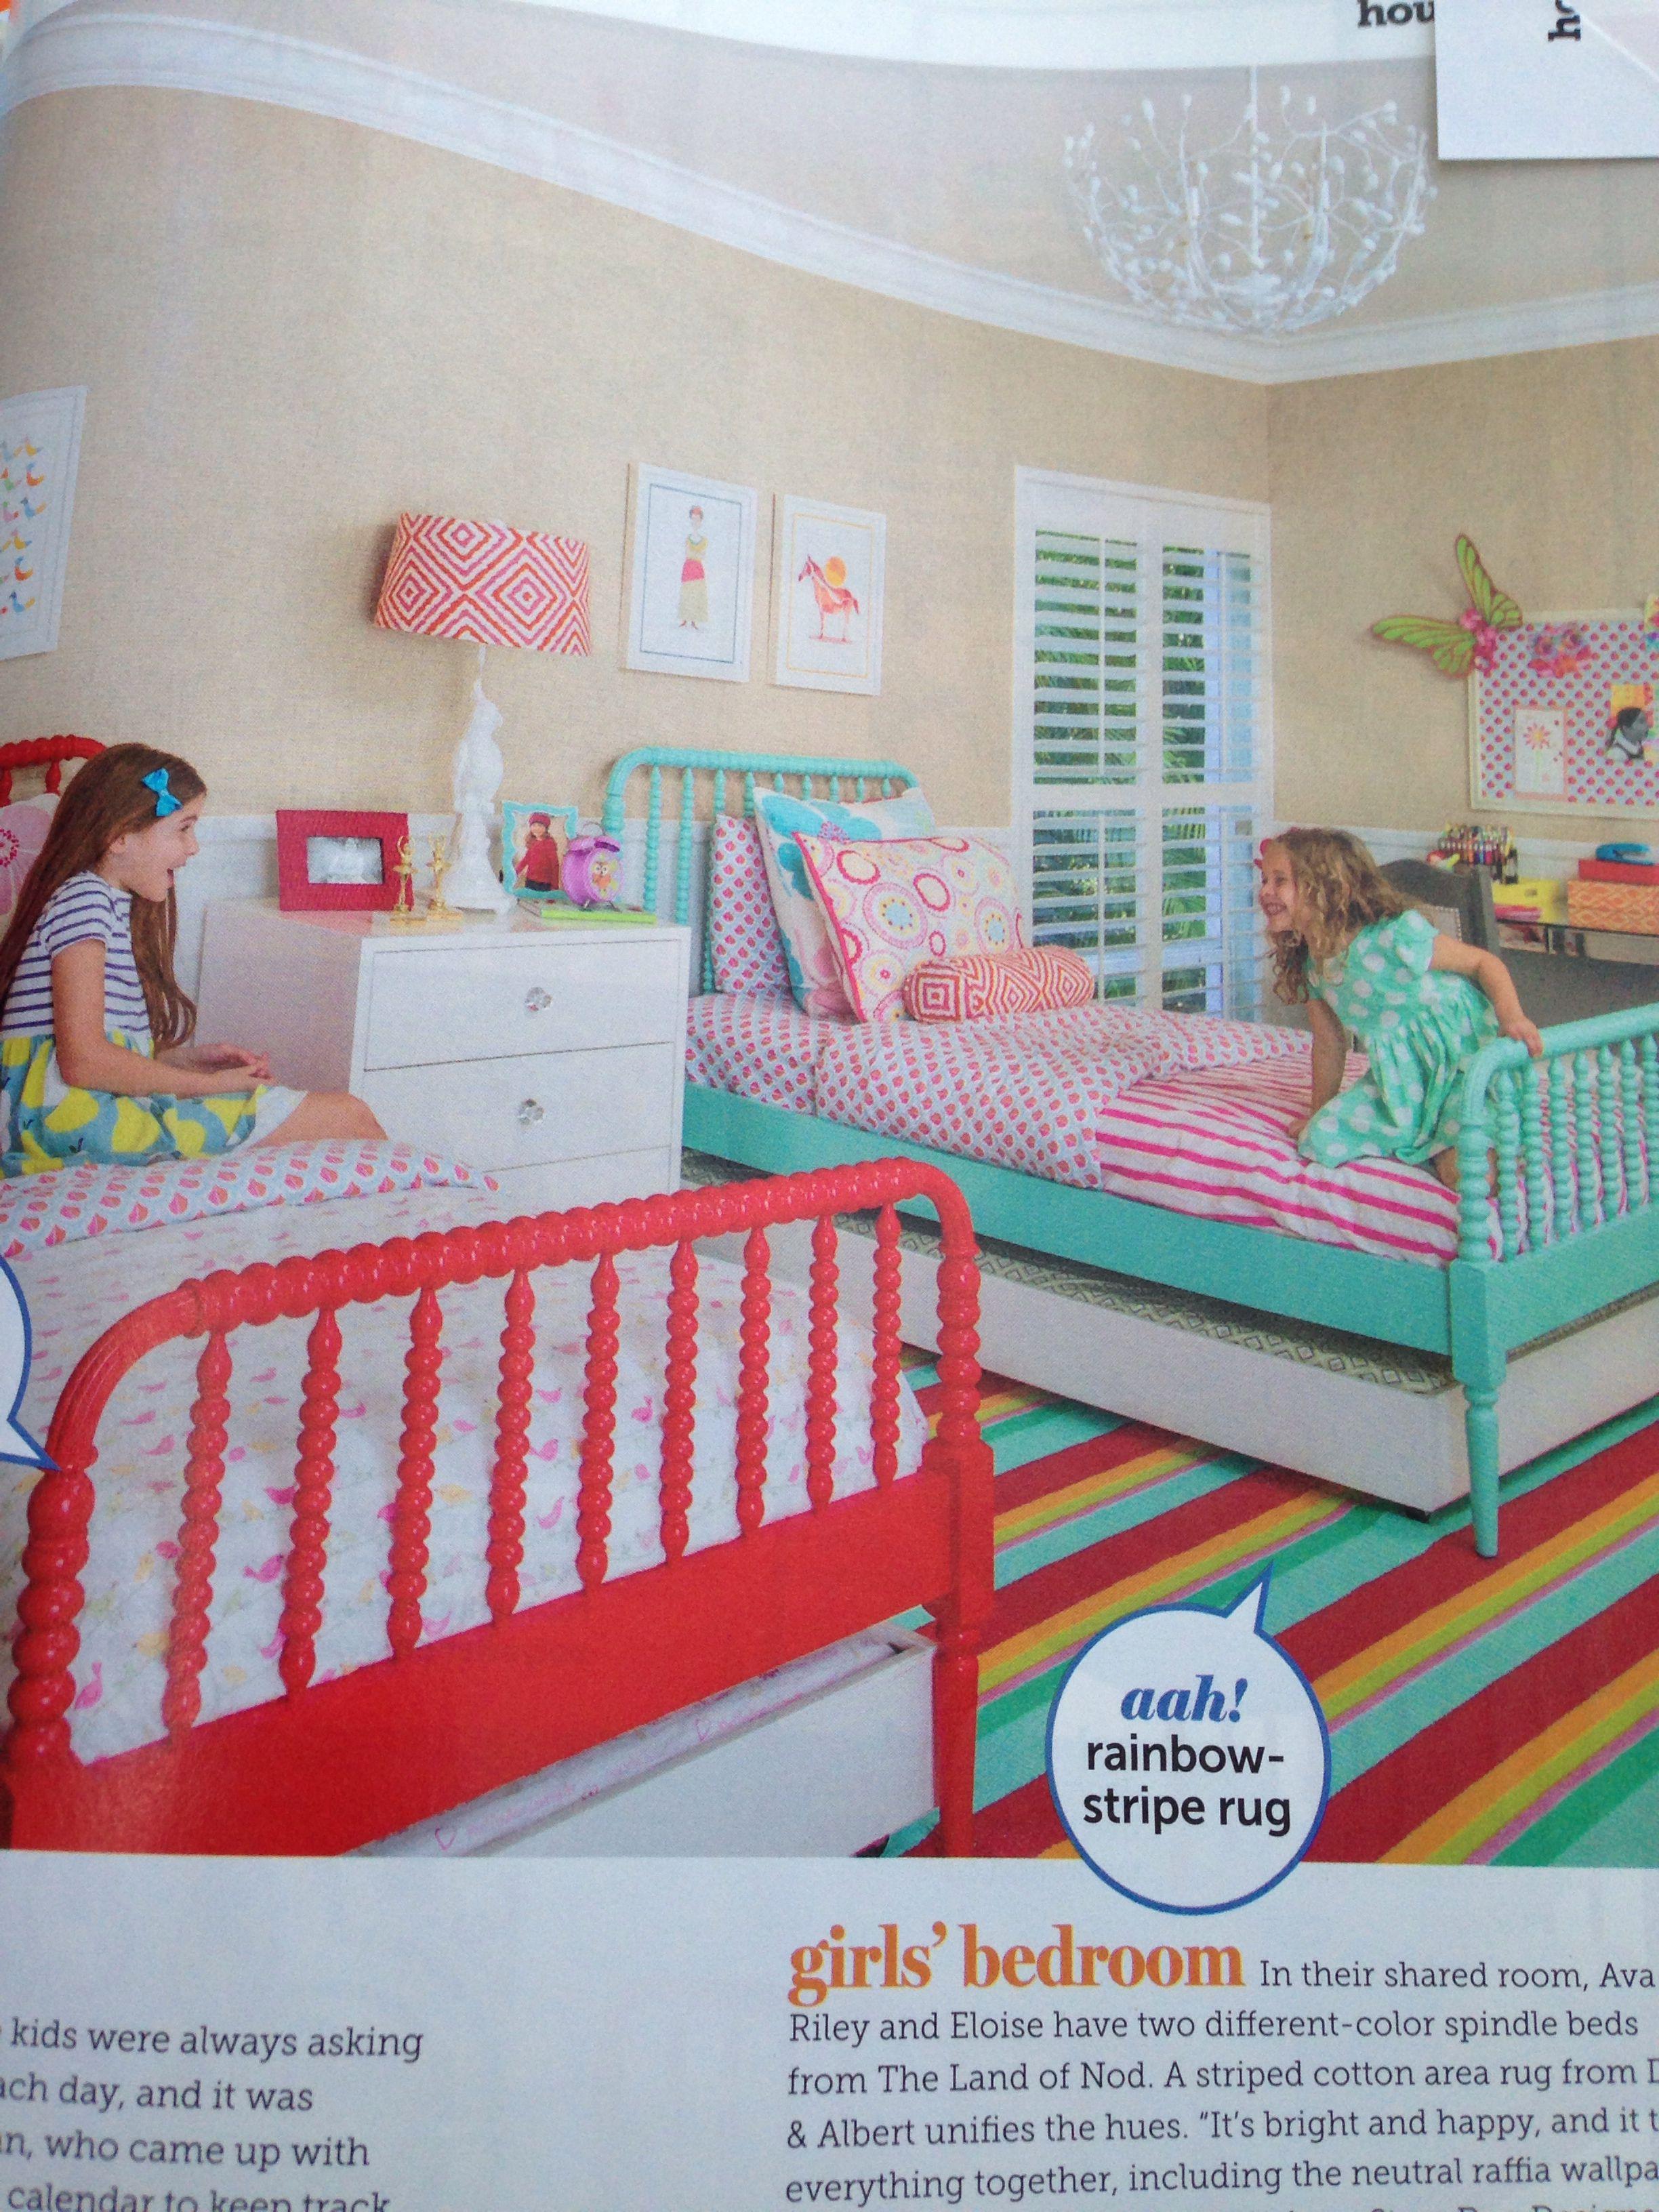 Land of nod beds. So fun! Andrea / FICTILIS Bryant now I